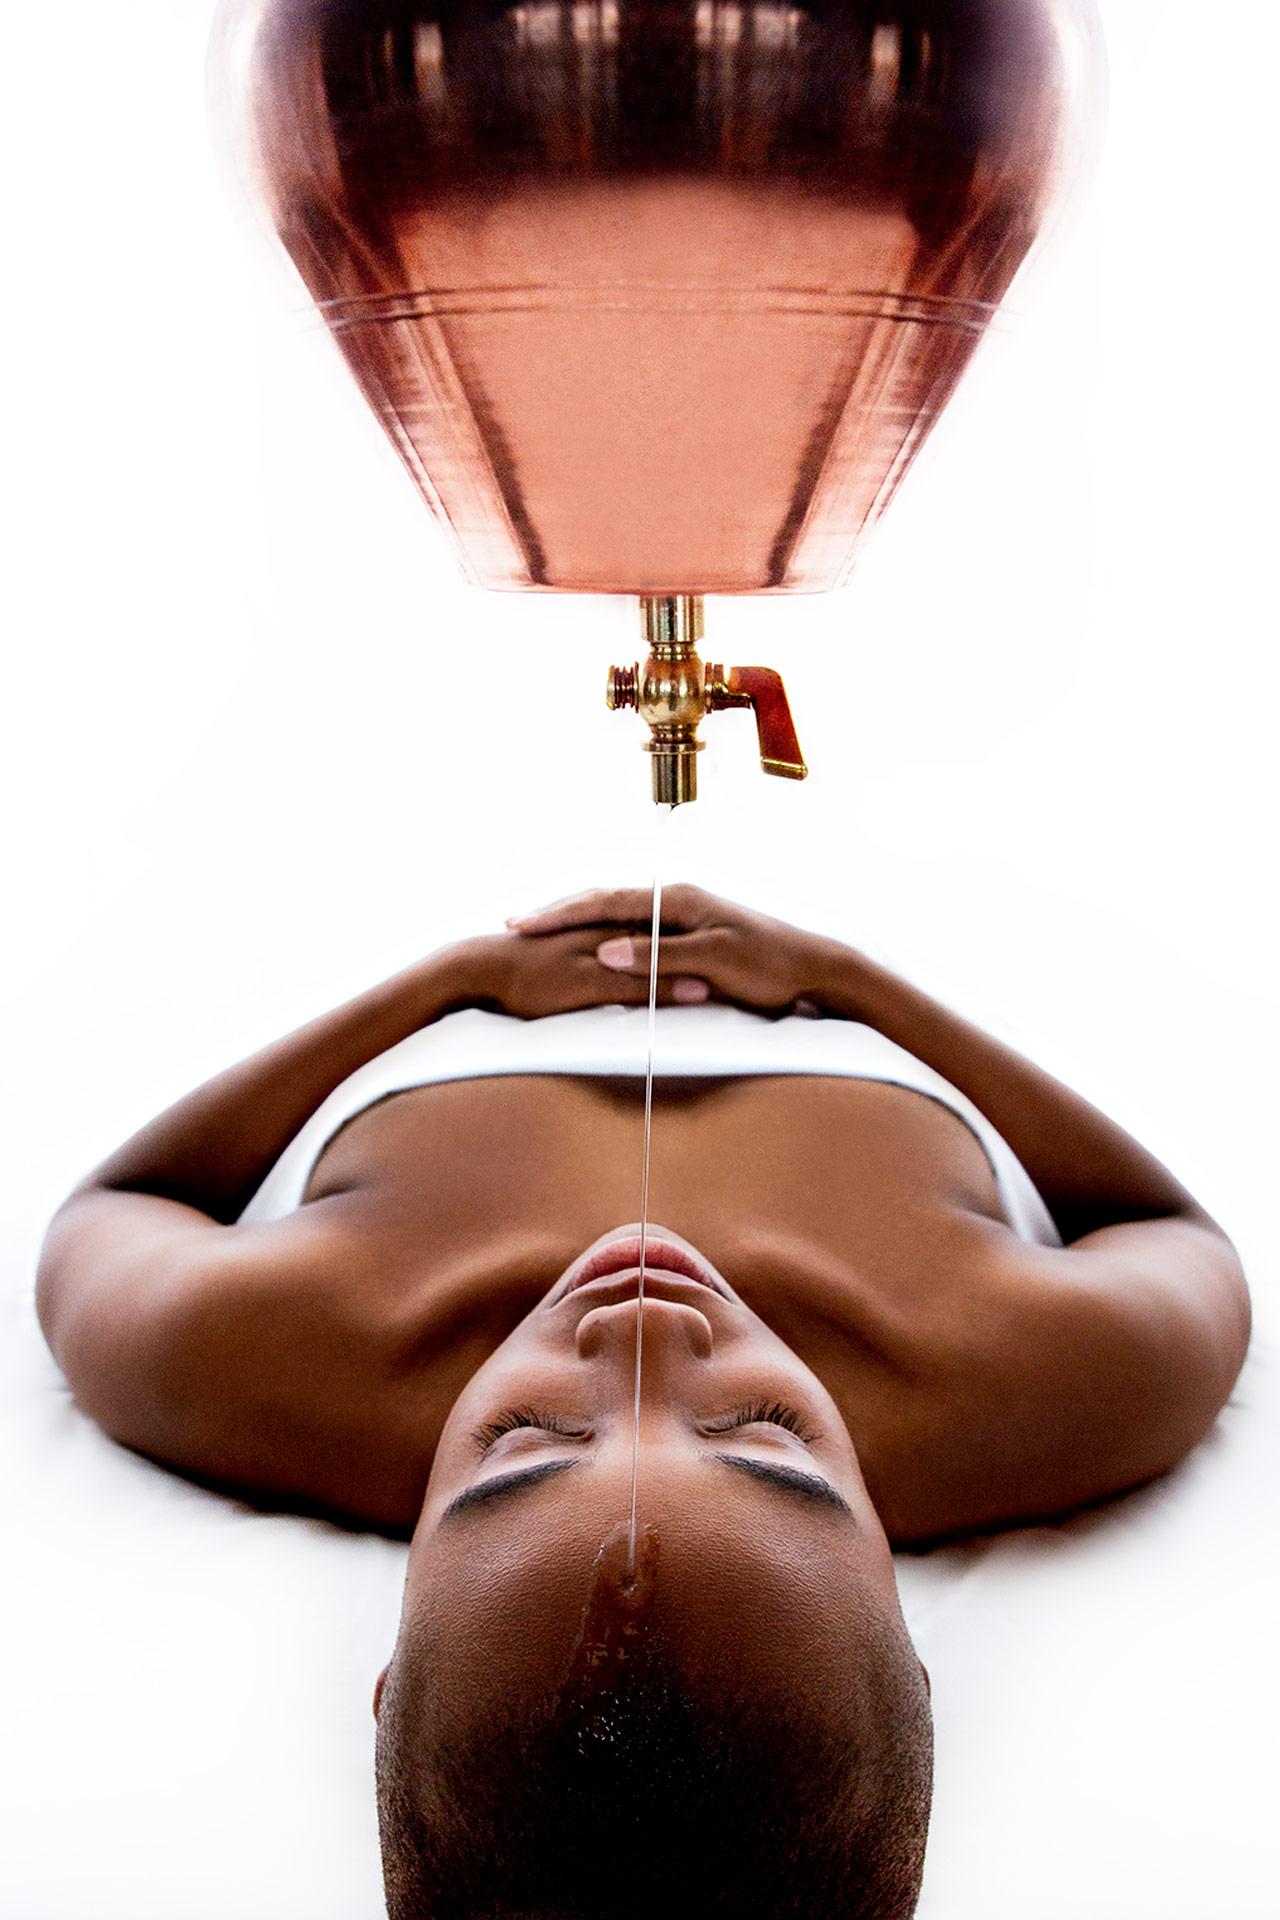 a woman getting a spa treatment where a liquid is dripped onto her head